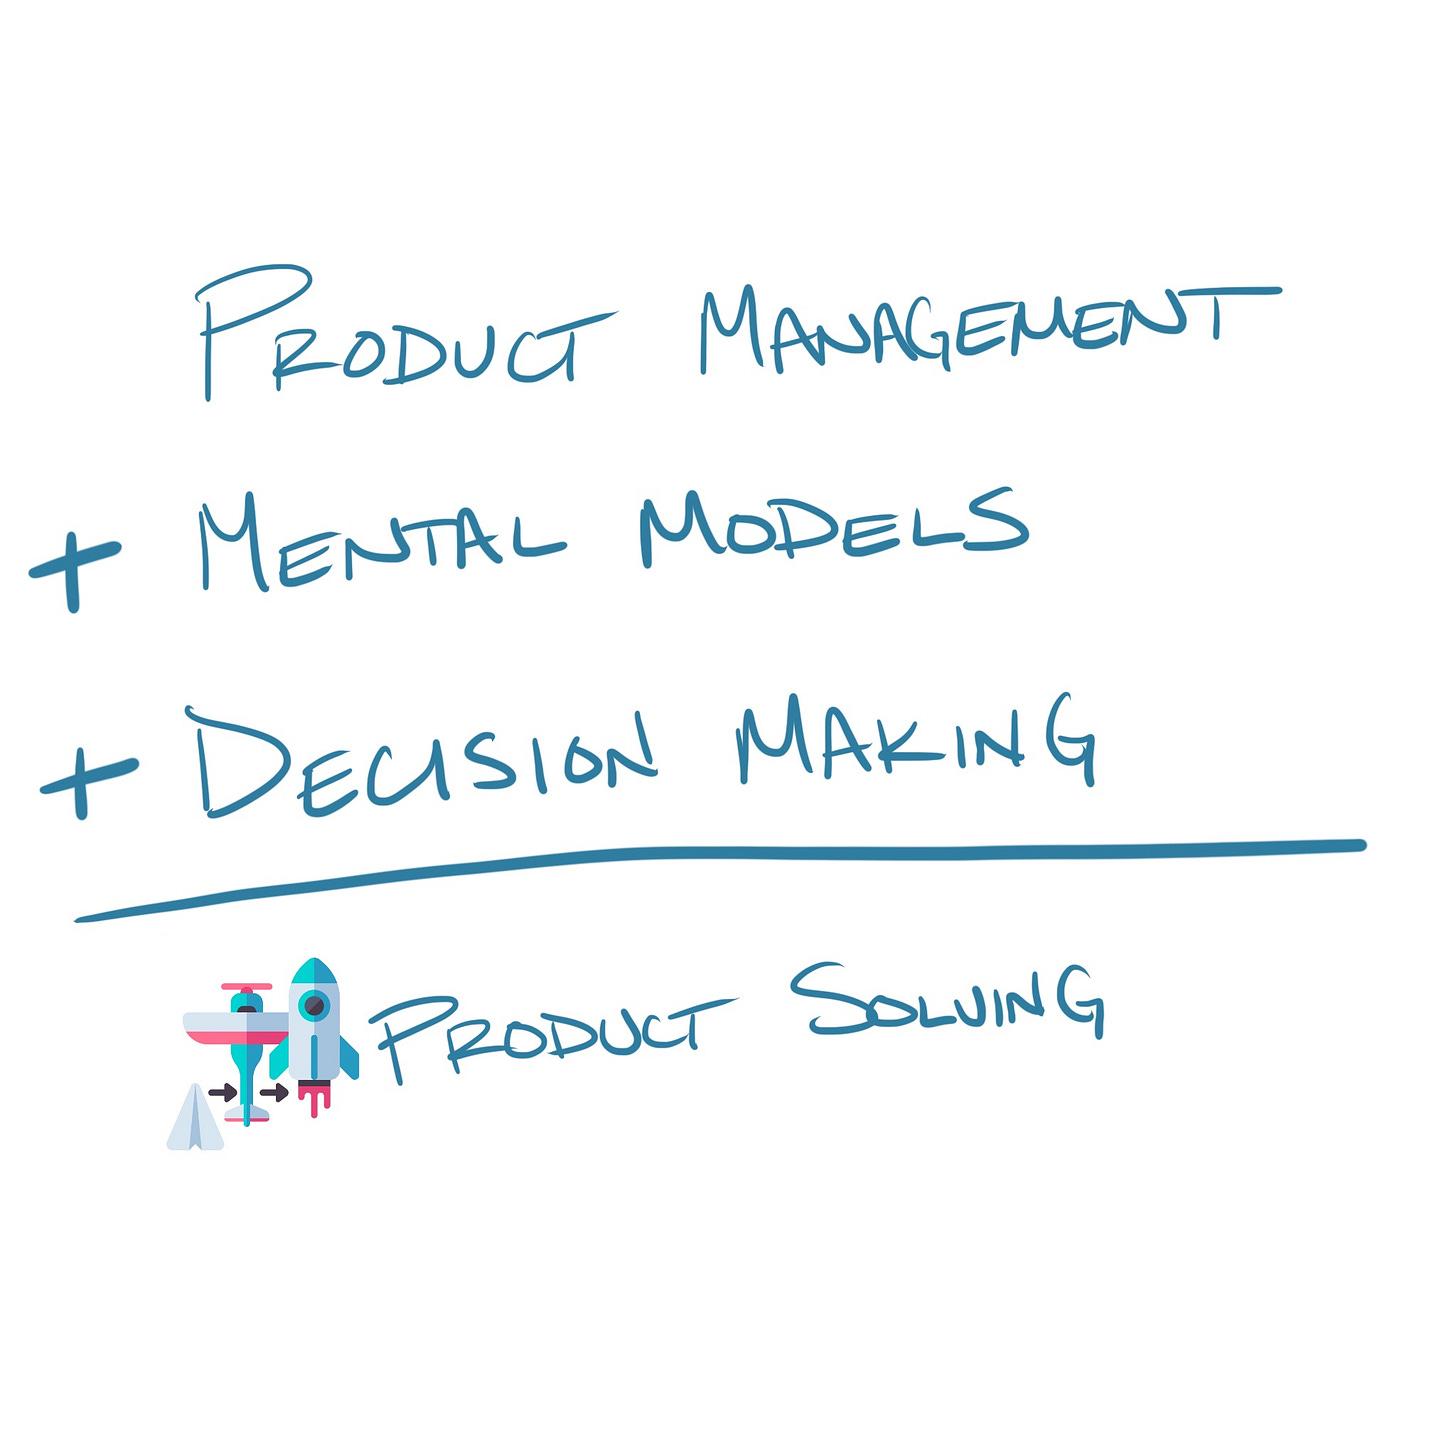 Product Management plus Mental Models plus Decision Making equals Product Solving